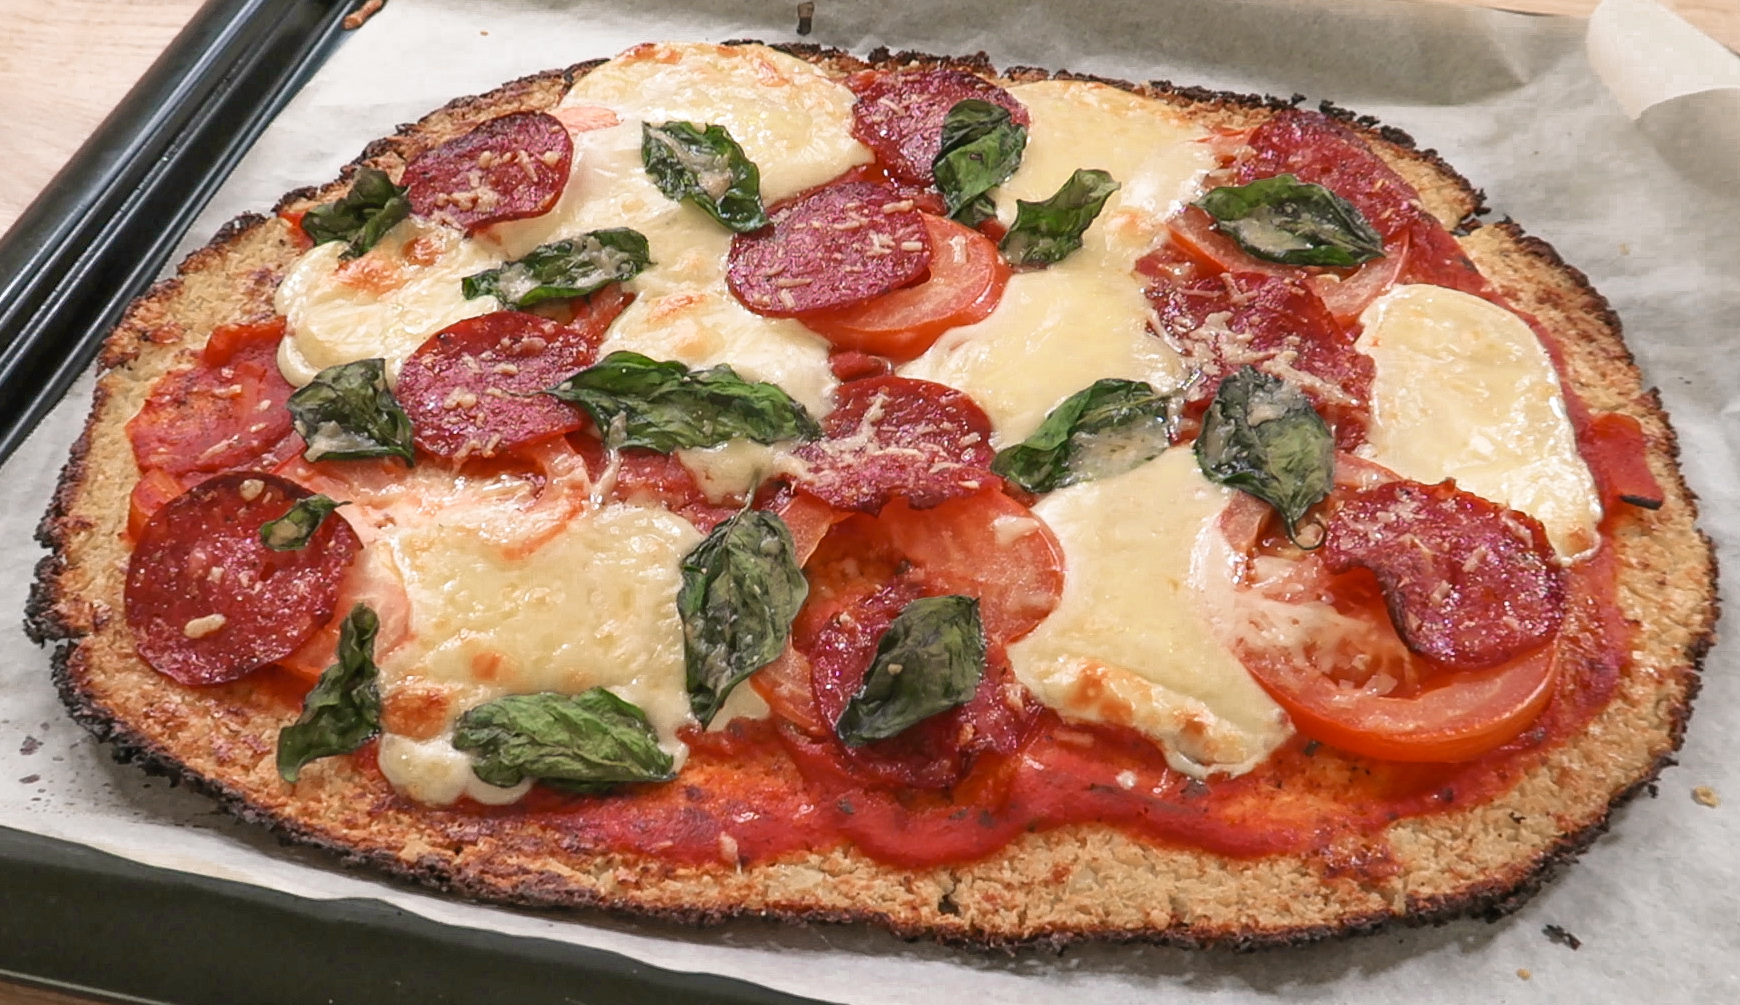 cauliflower crust pizza.jpg